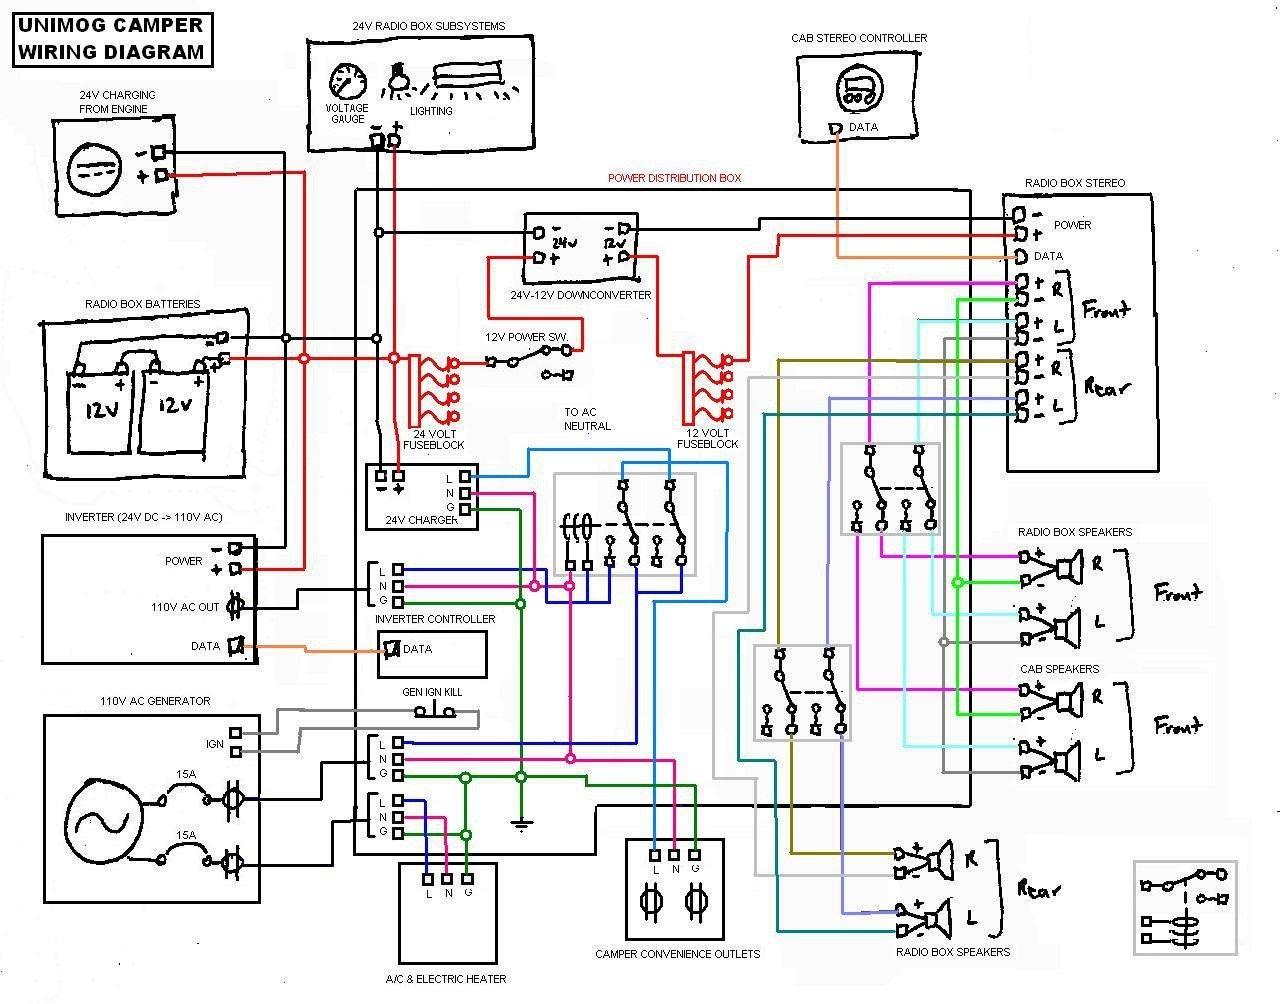 Image Result For Campervan Electrical Wiring Diagram Trailer Wiring Diagram Electrical Wiring Diagram Boat Wiring